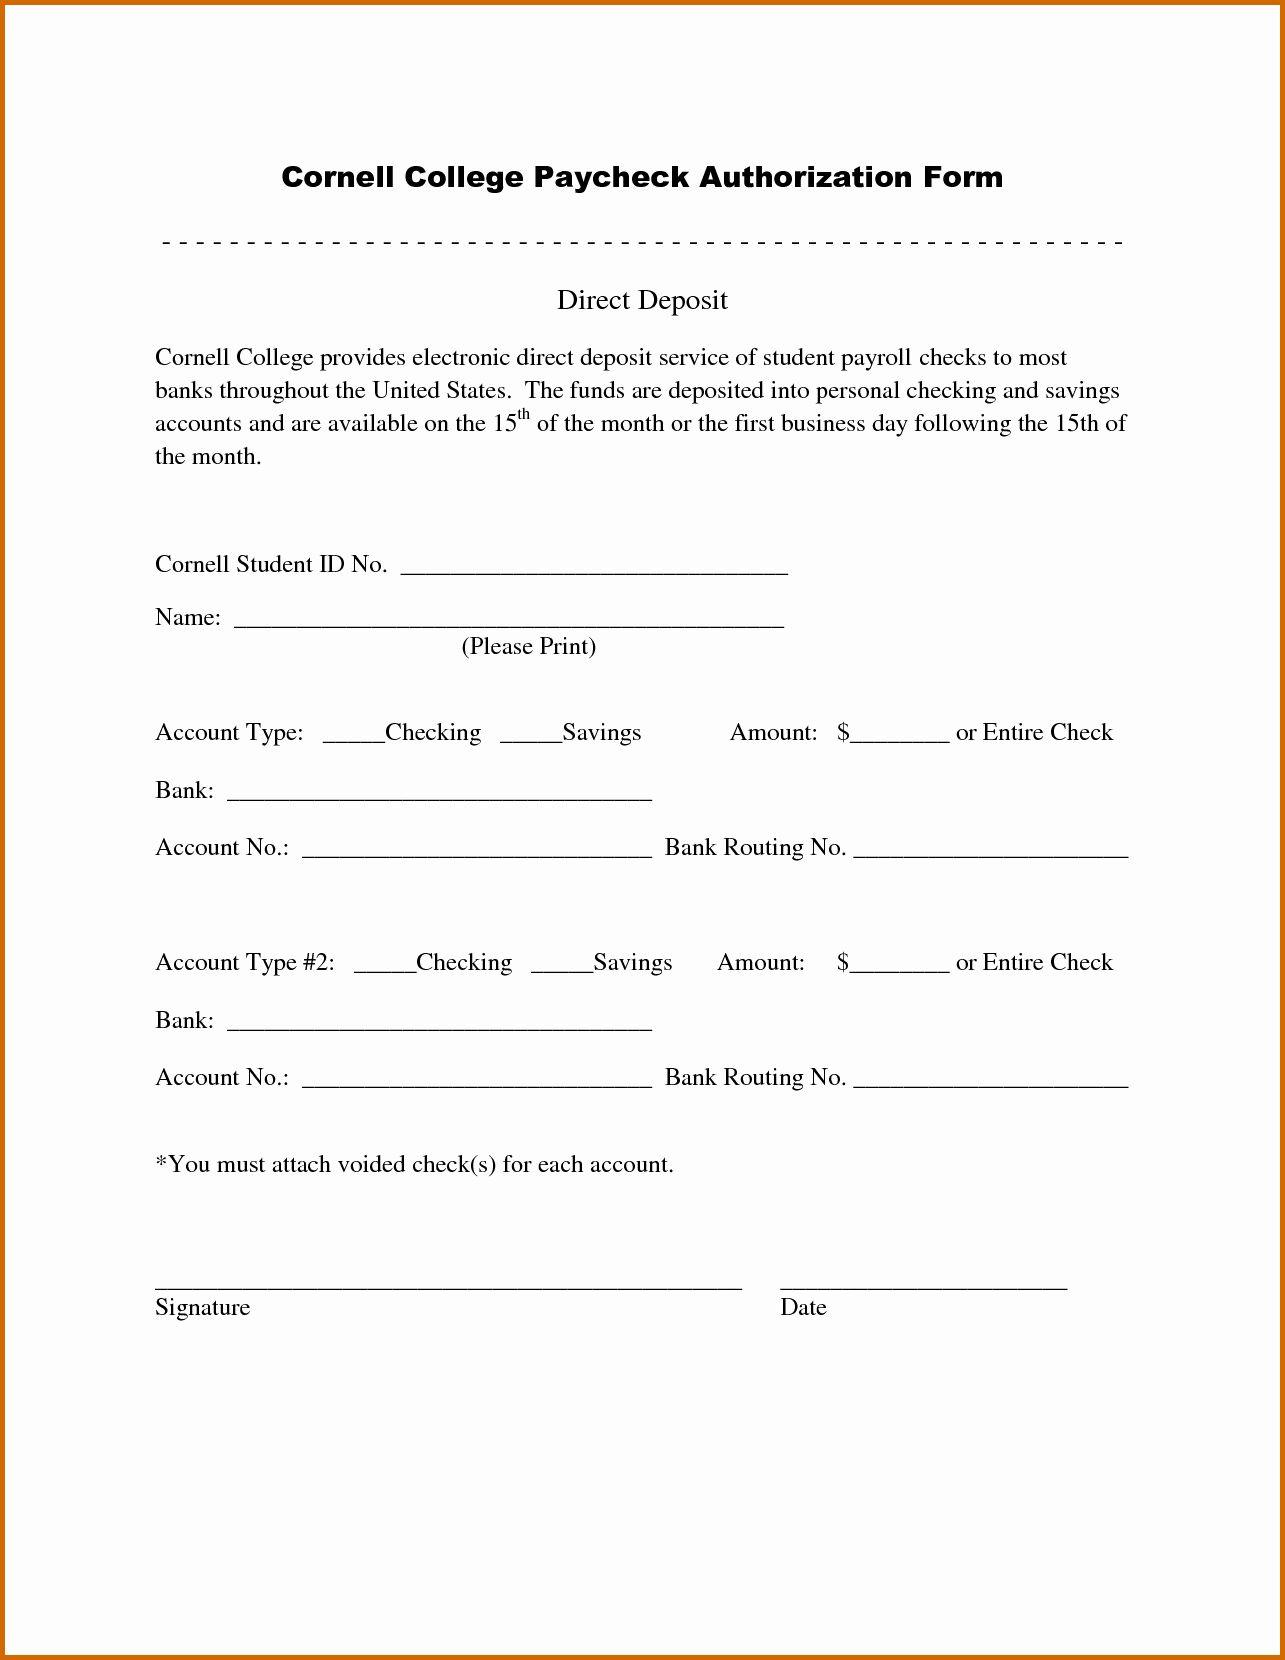 Direct Deposit Authorization Form Template Elegant 12 Sample